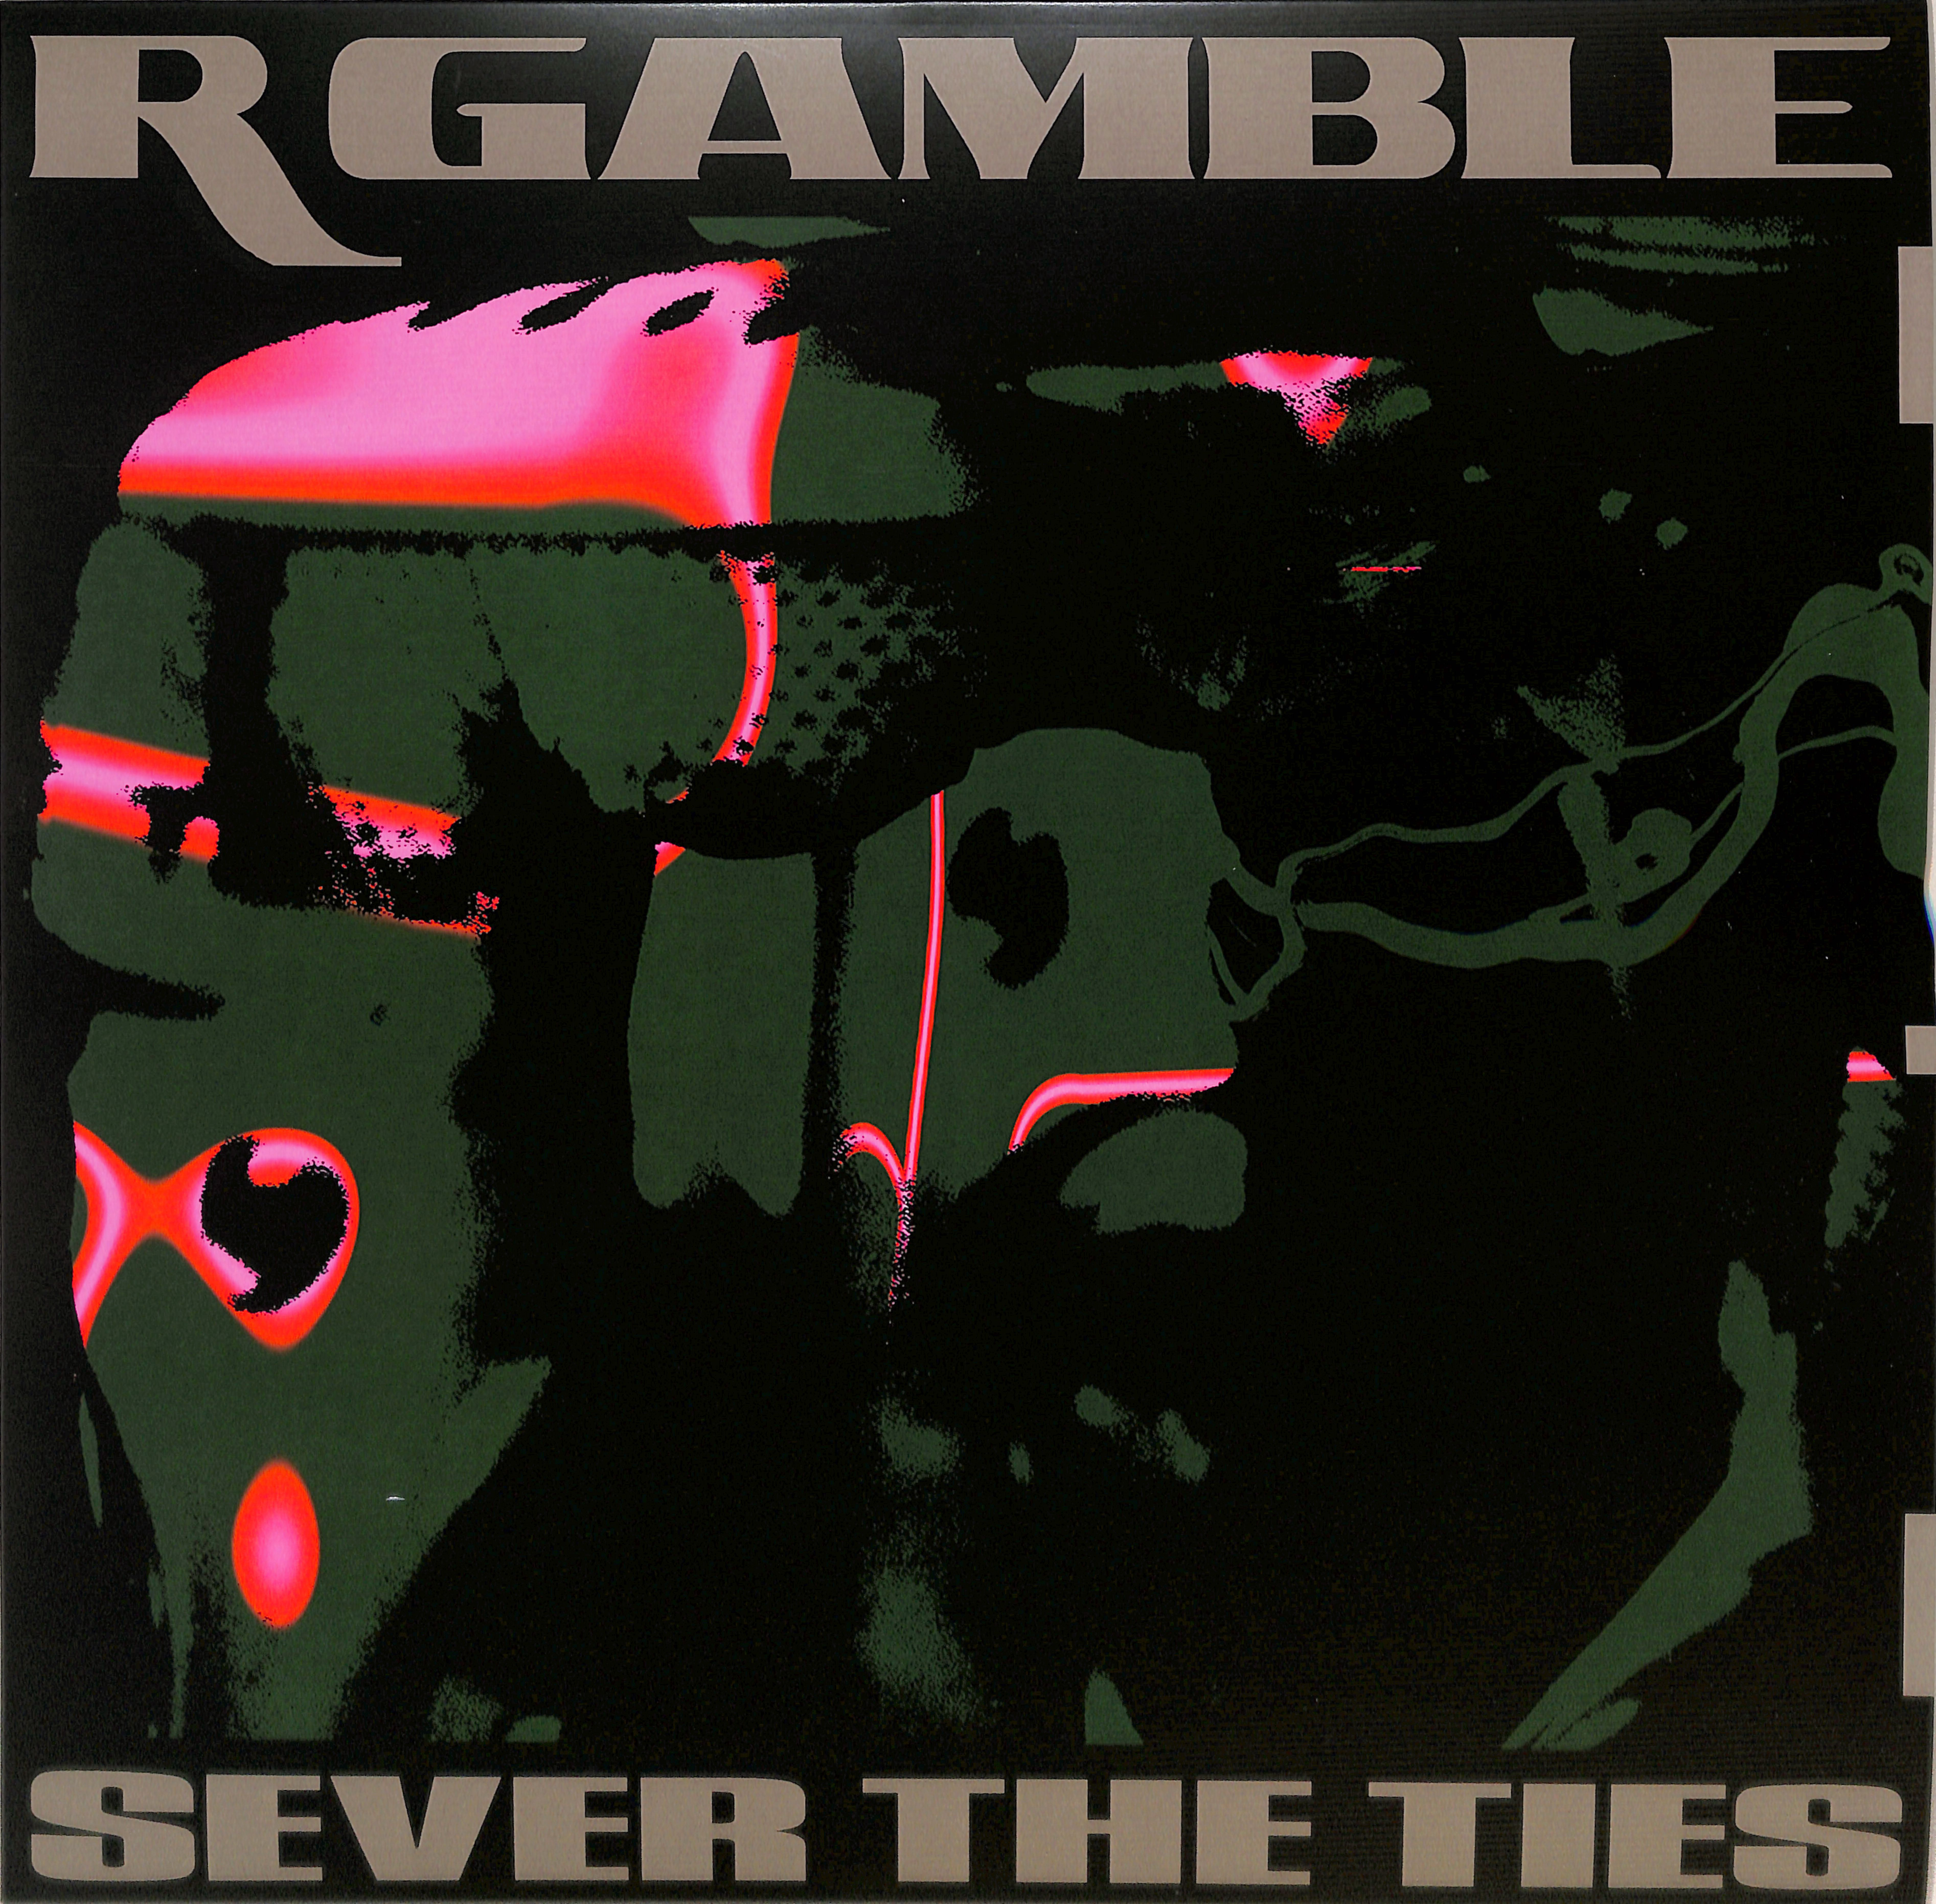 R Gamble - SEVER THE TIES